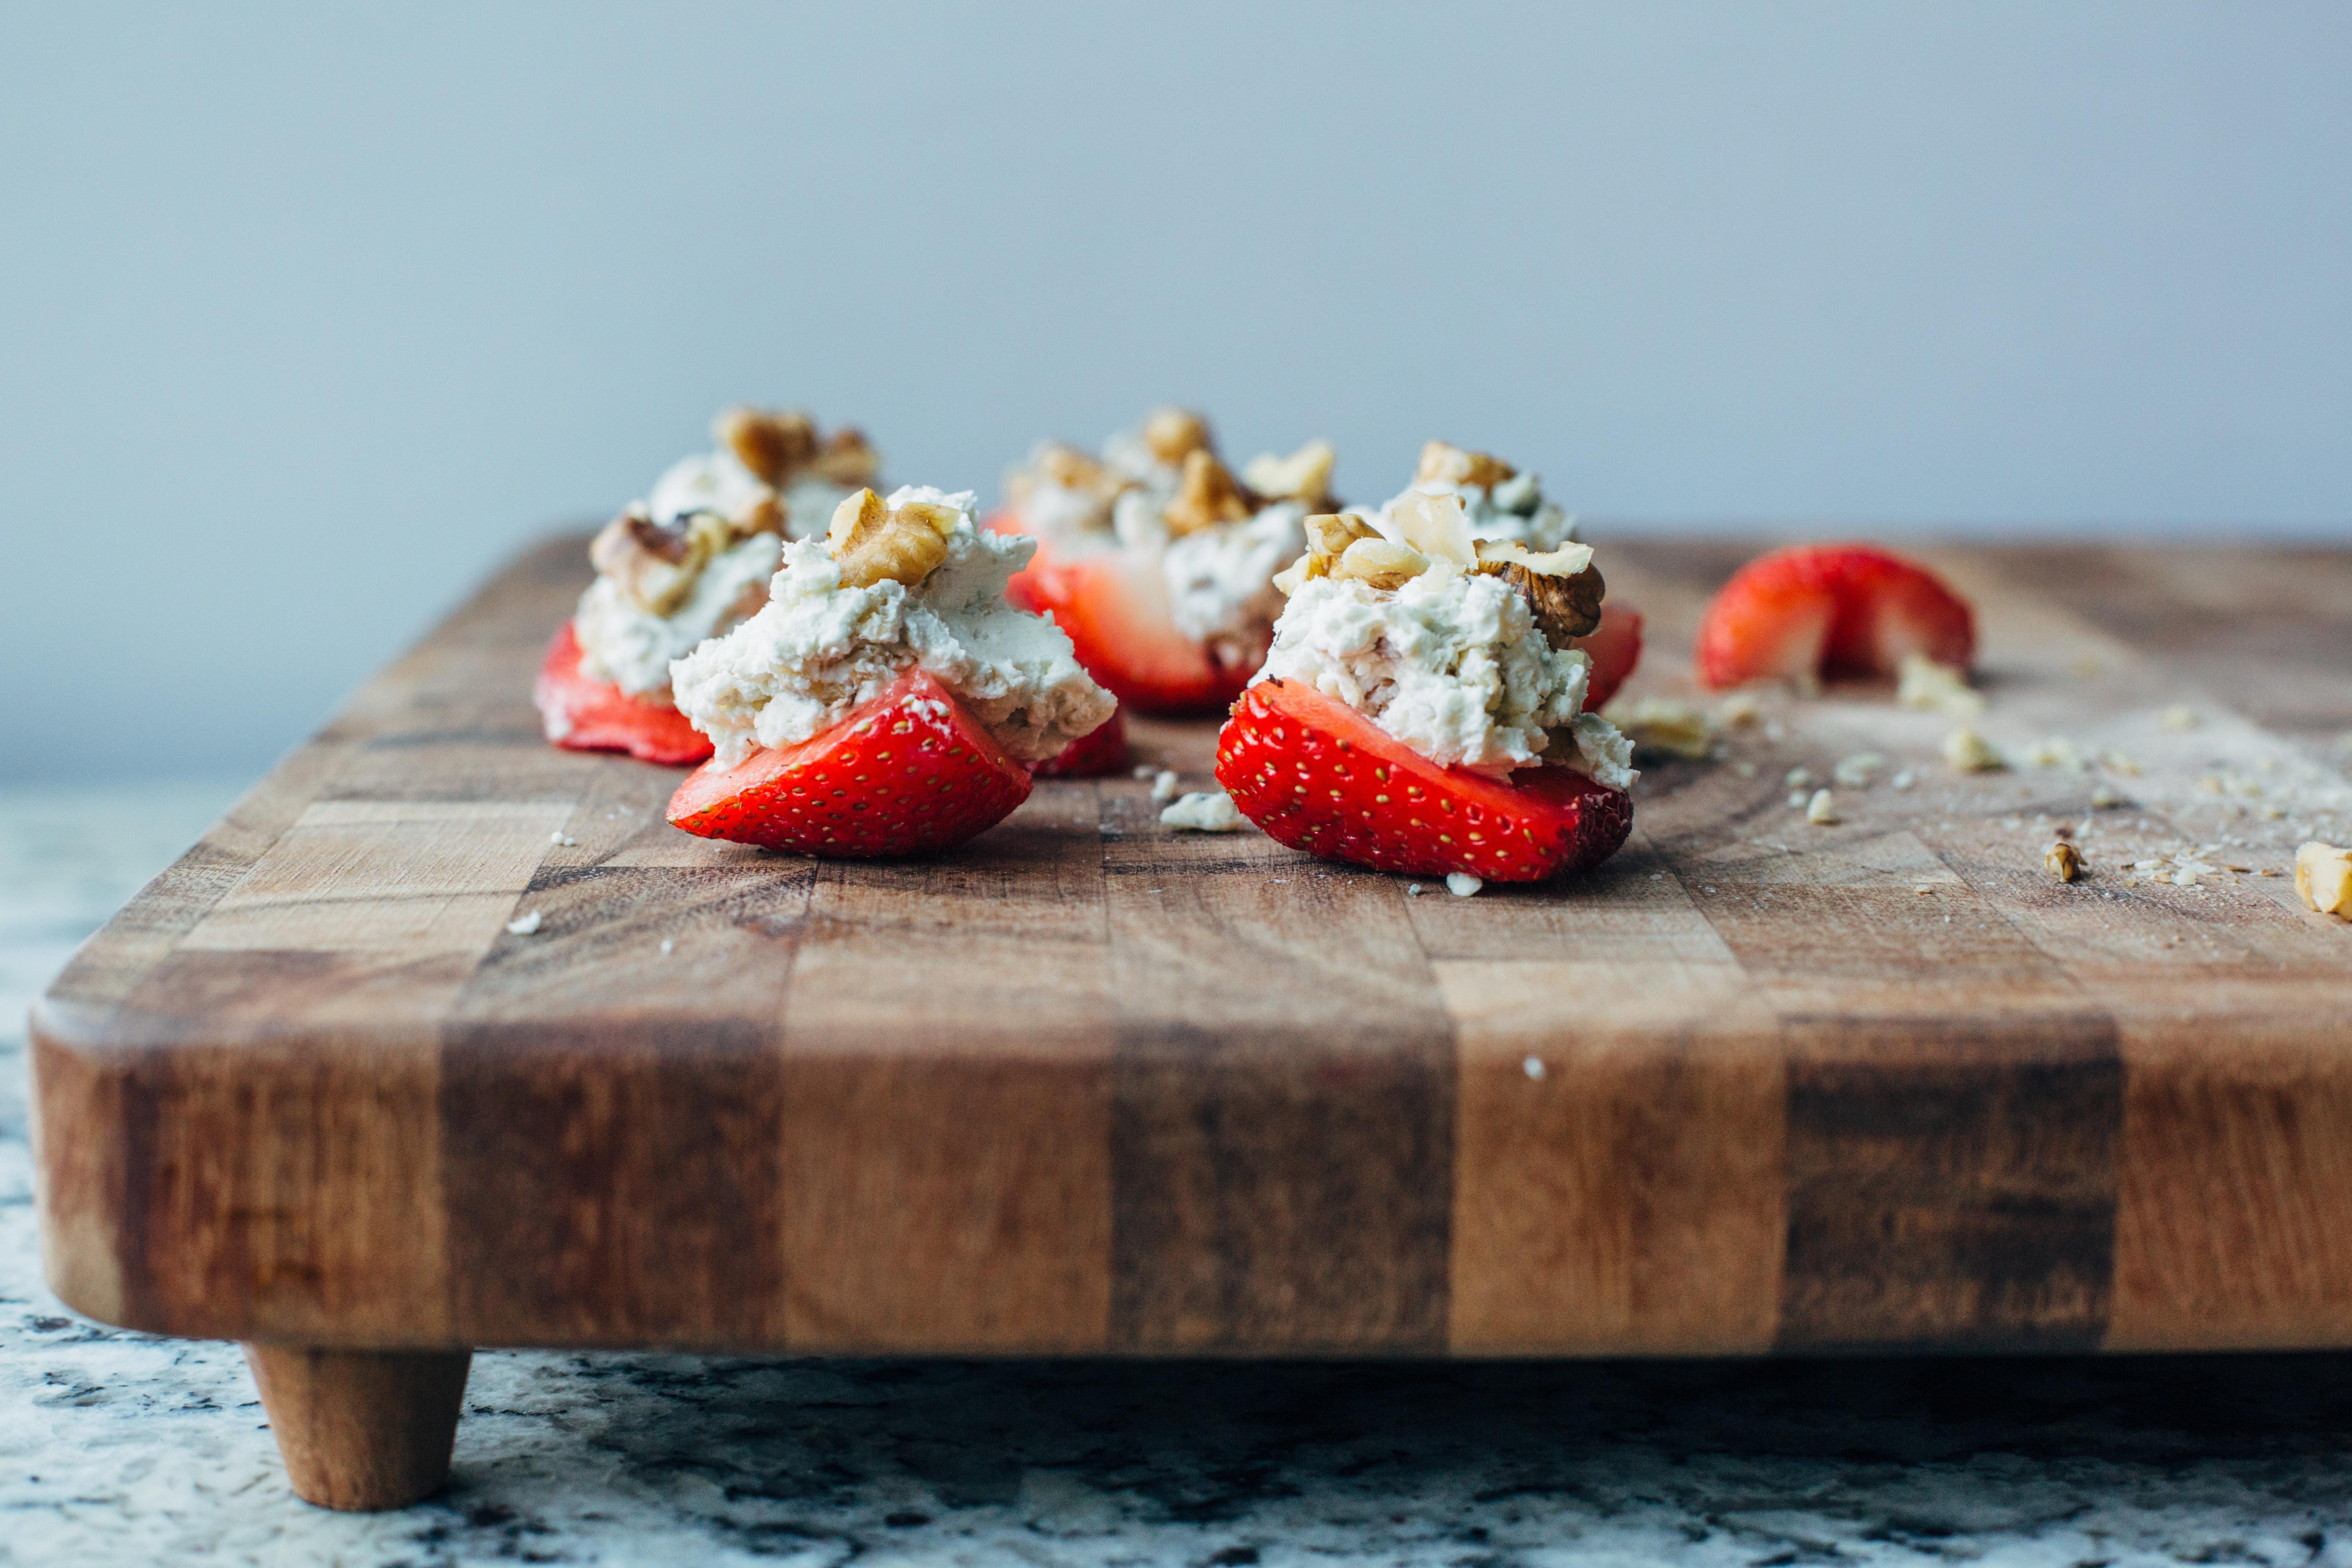 Blue Cheese & Walnut Stuffed Strawberries